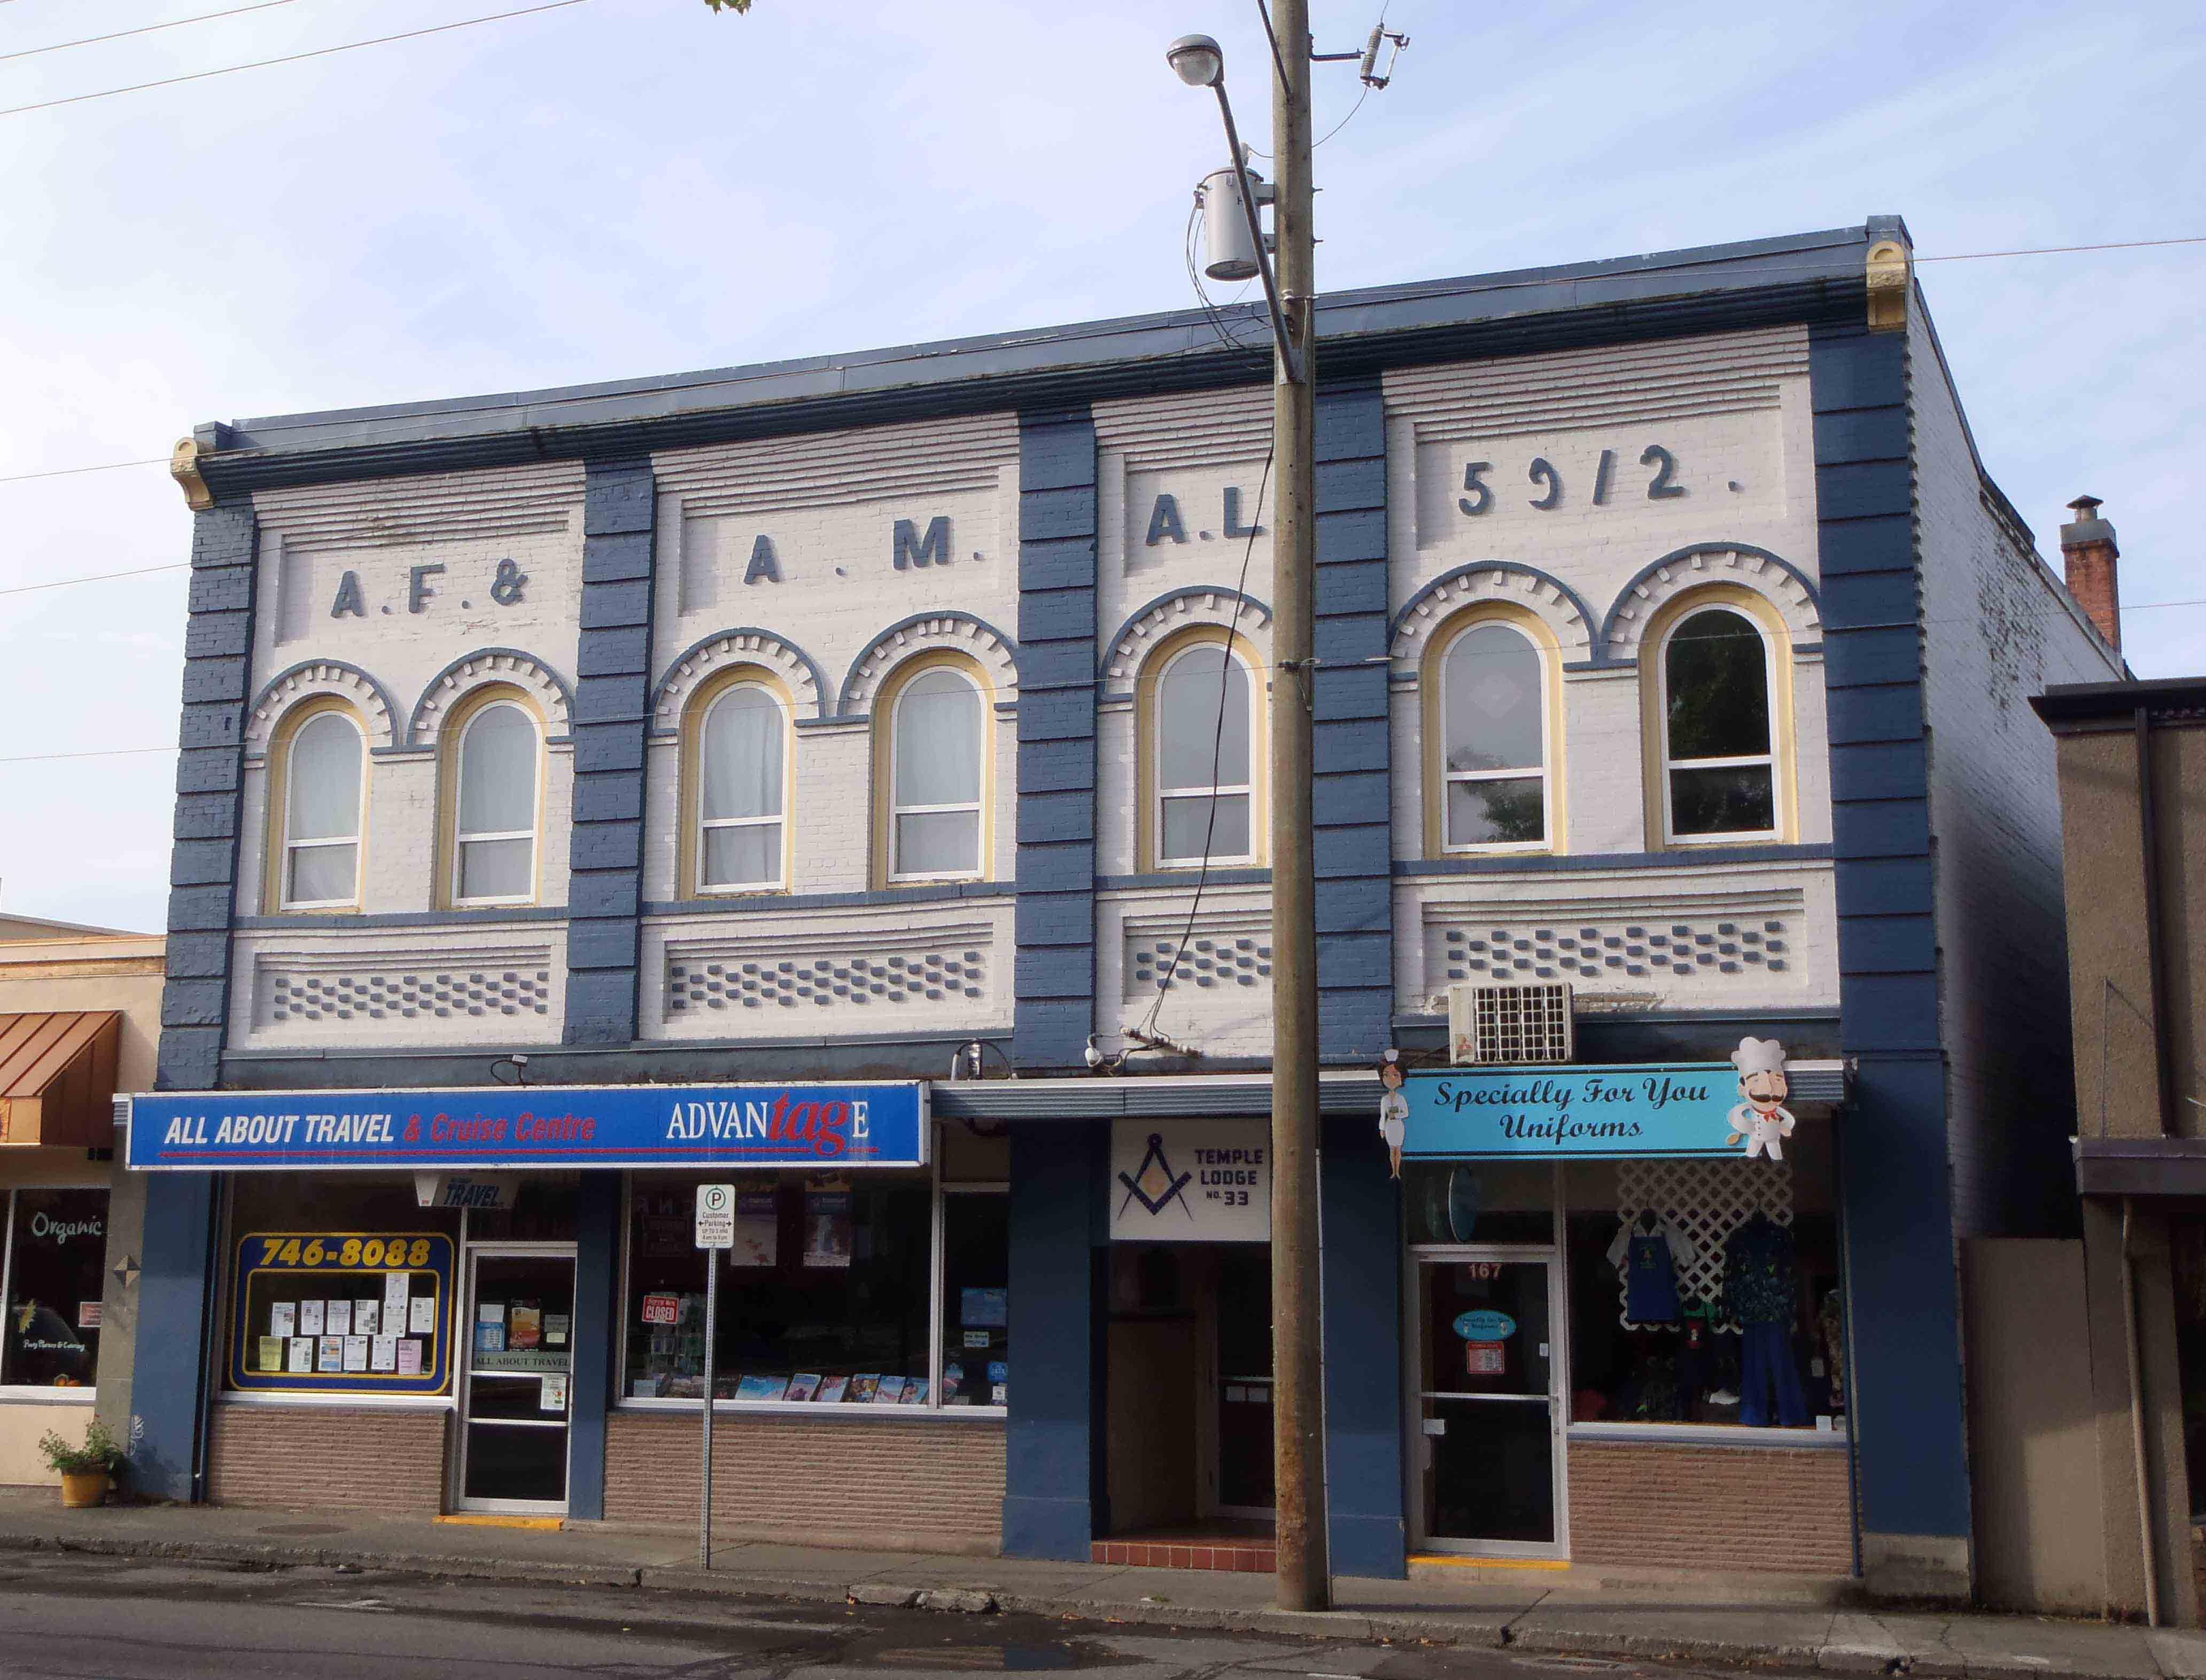 Masonic Temple - Duncan, B.C., Canada